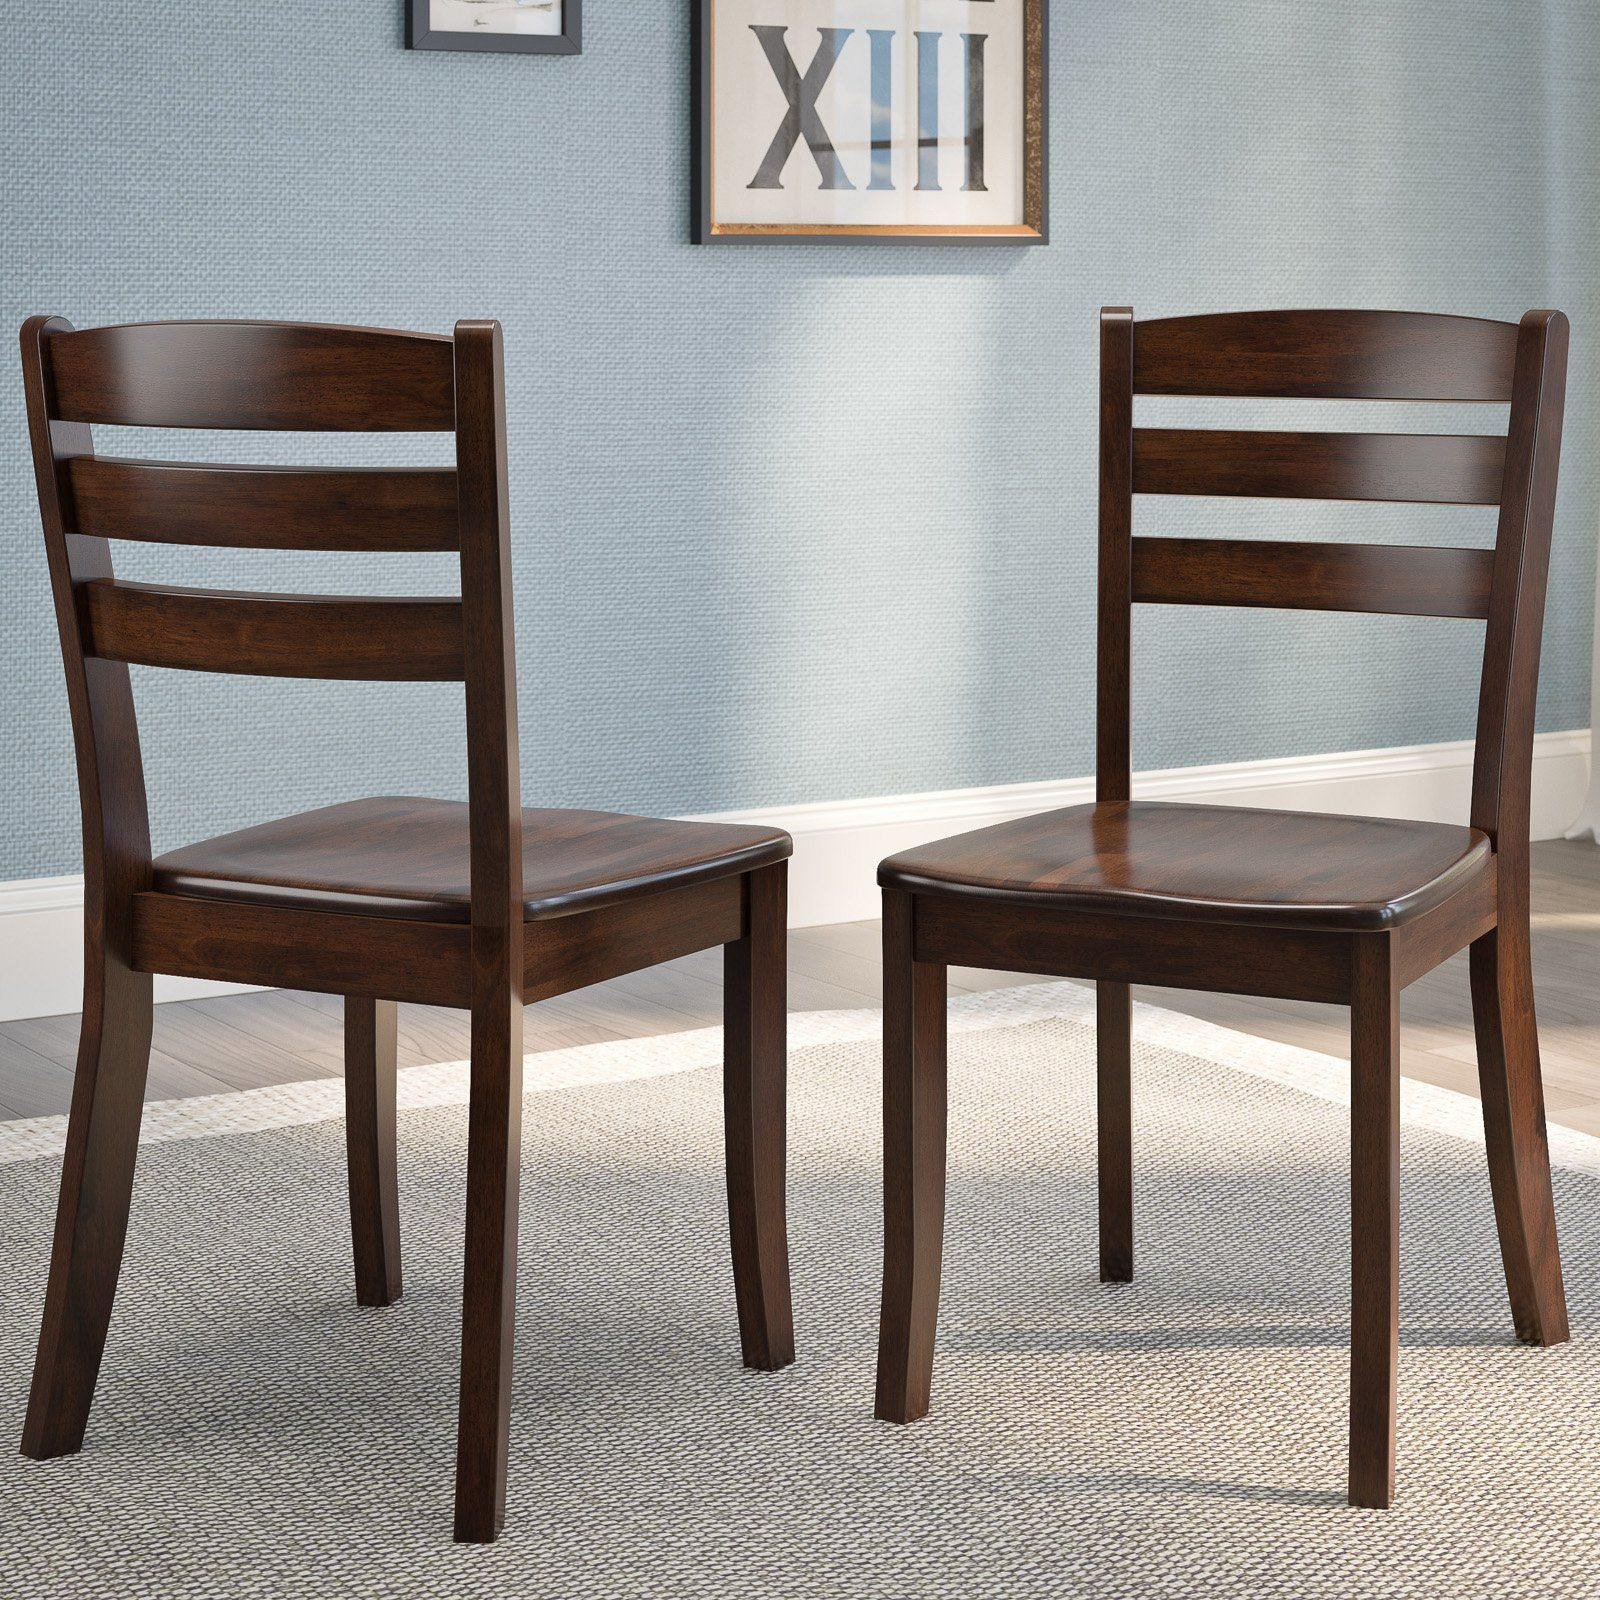 Wondrous Corliving Dillon Horizontal Slat Dining Chair Set Of 2 In Inzonedesignstudio Interior Chair Design Inzonedesignstudiocom